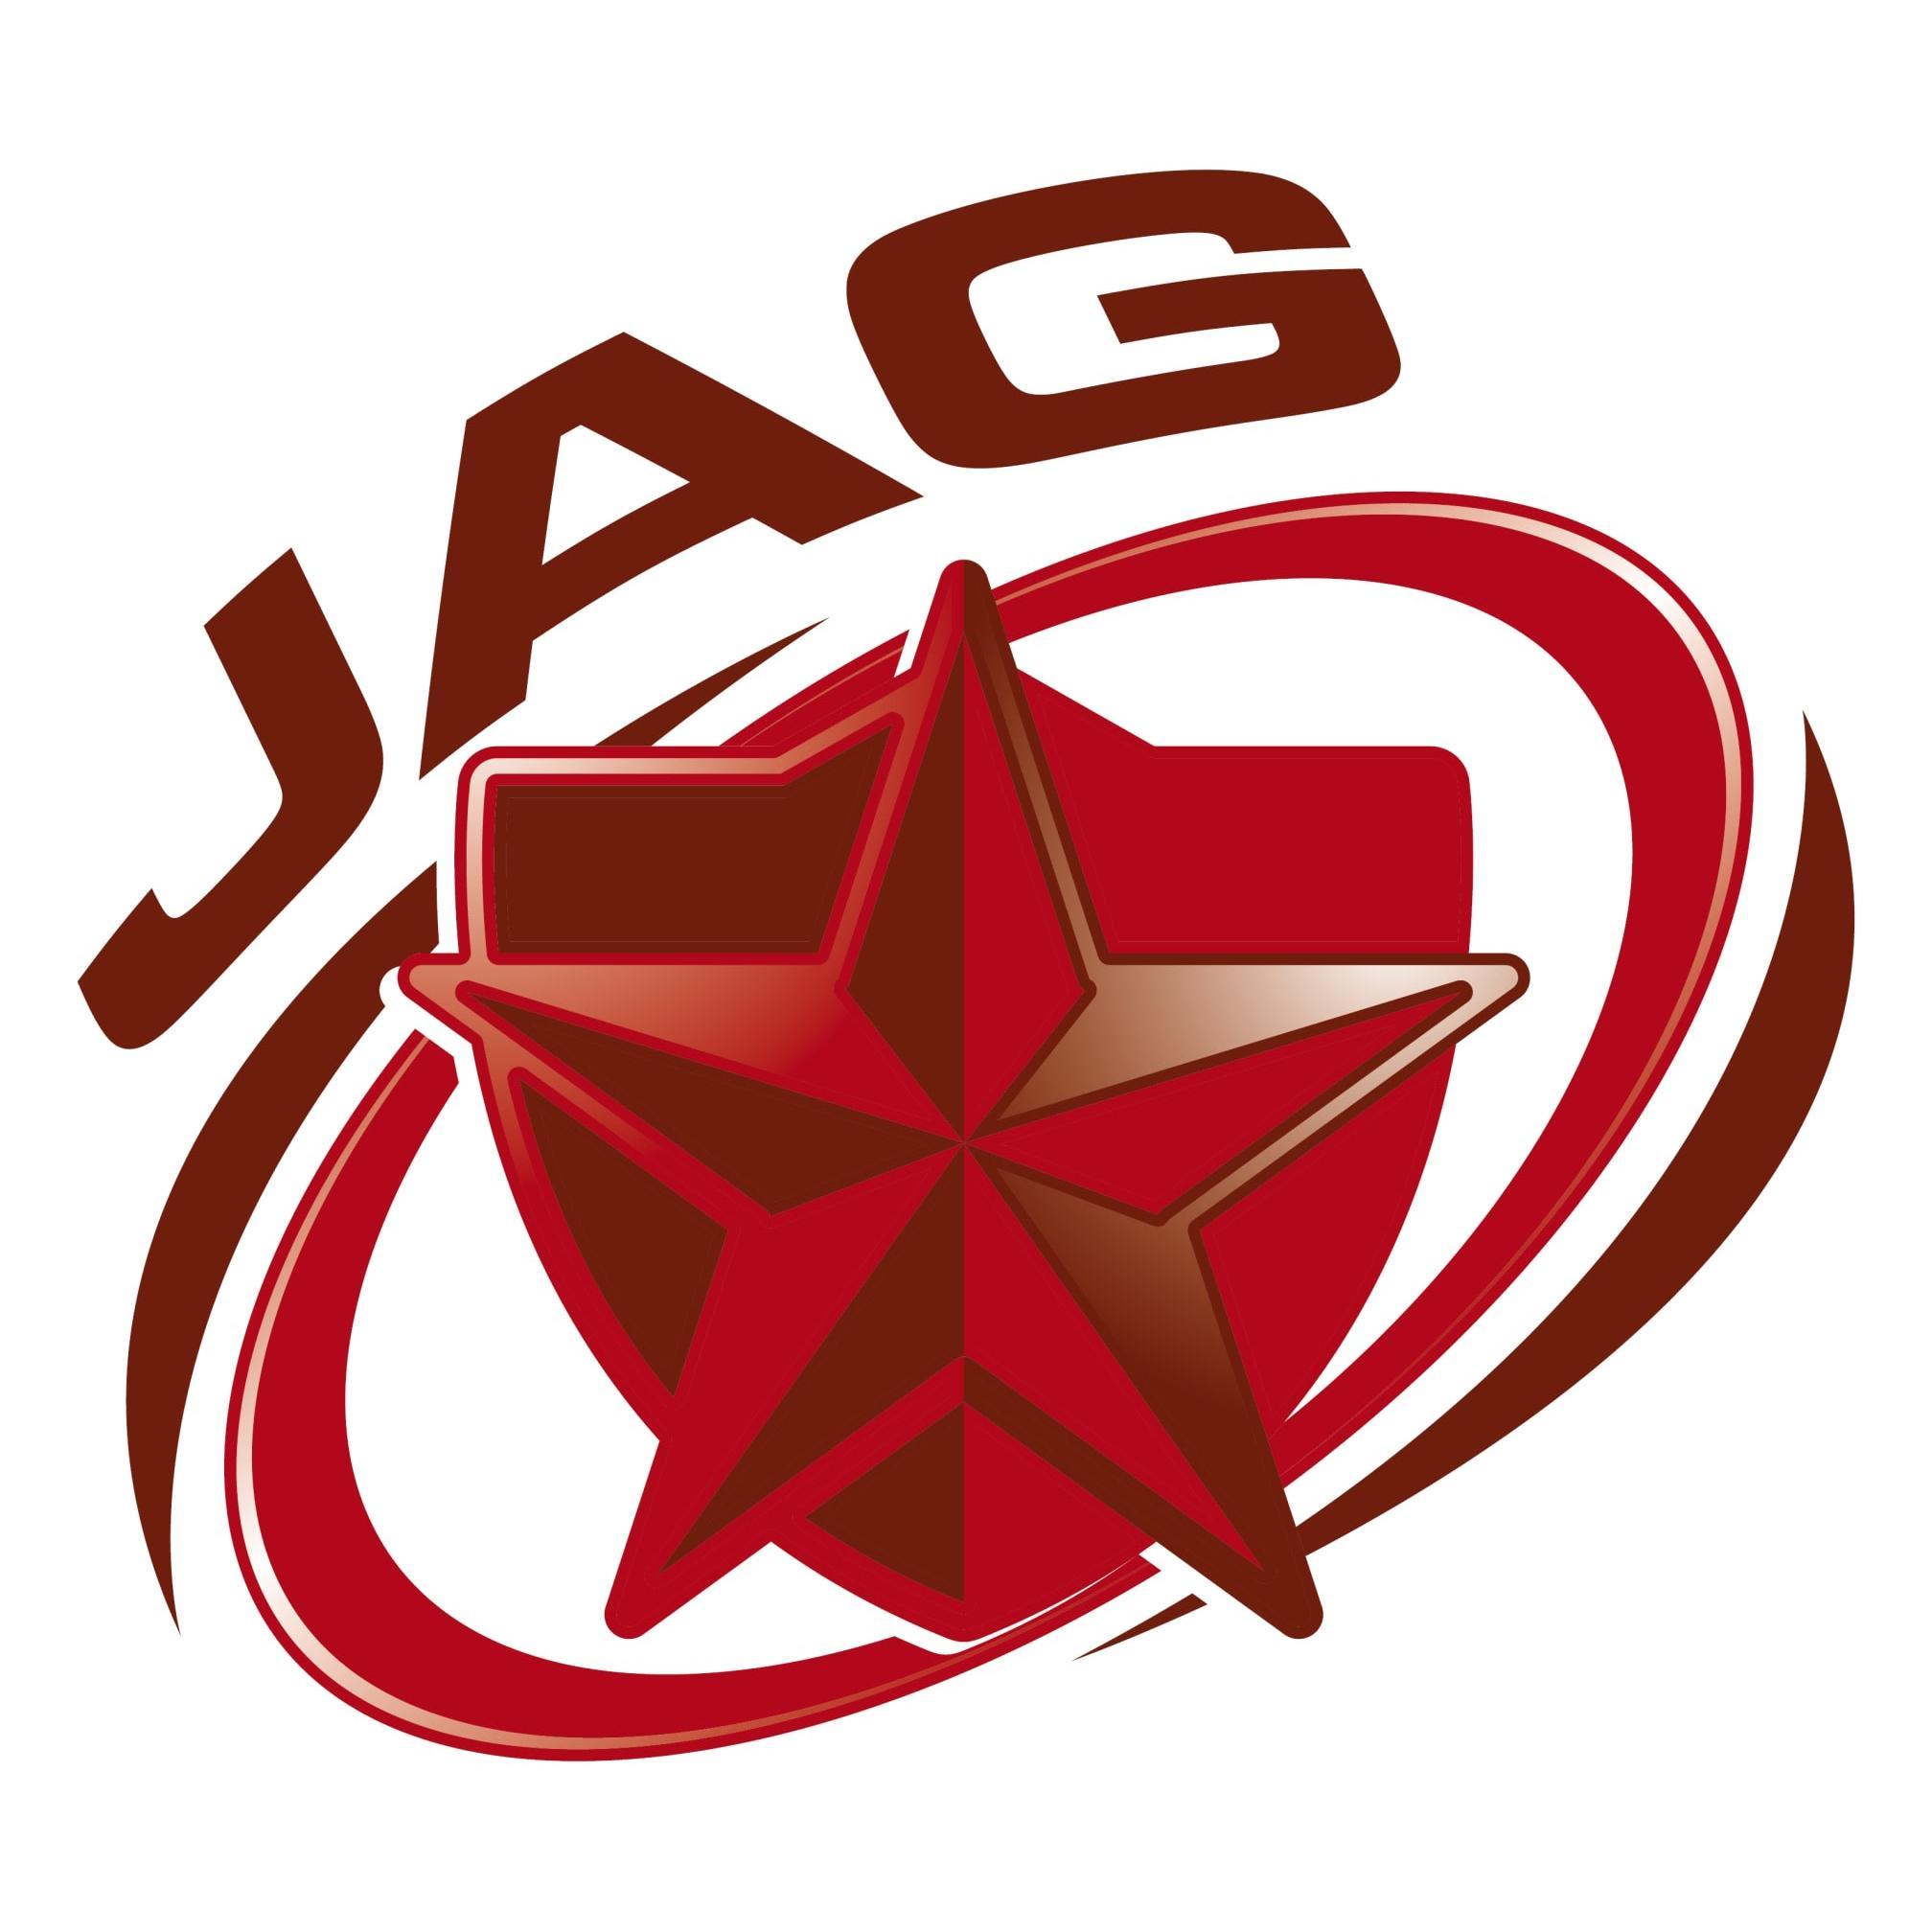 Jag Security Ltd - Beccles, Essex NR34 9HE - 08442 473655 | ShowMeLocal.com